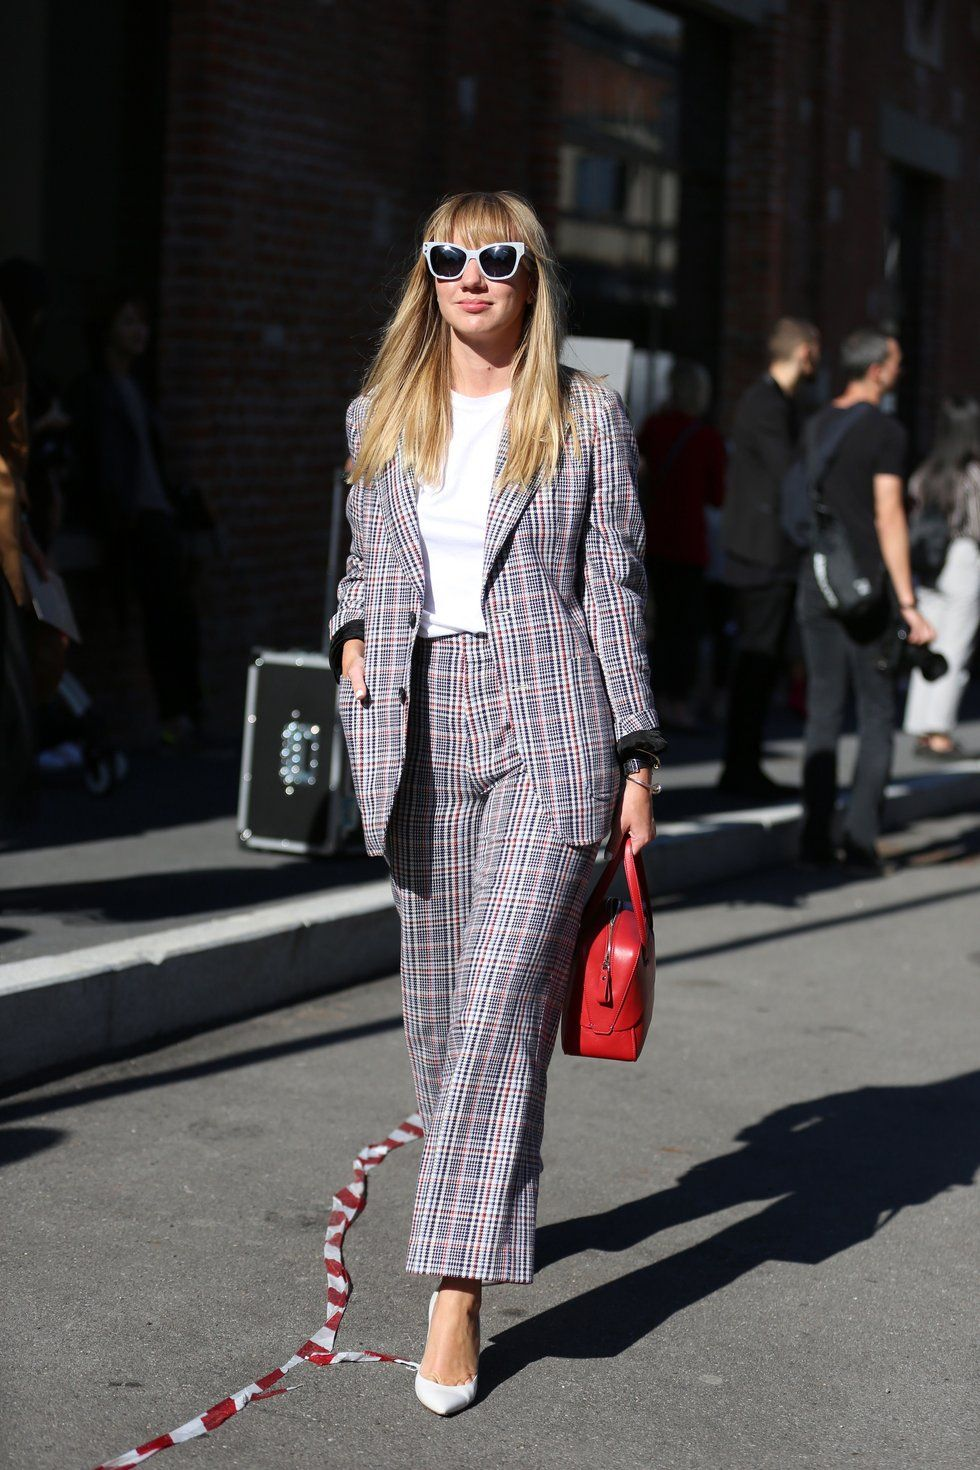 Street style highlights from Milan Fashion Week Fashion